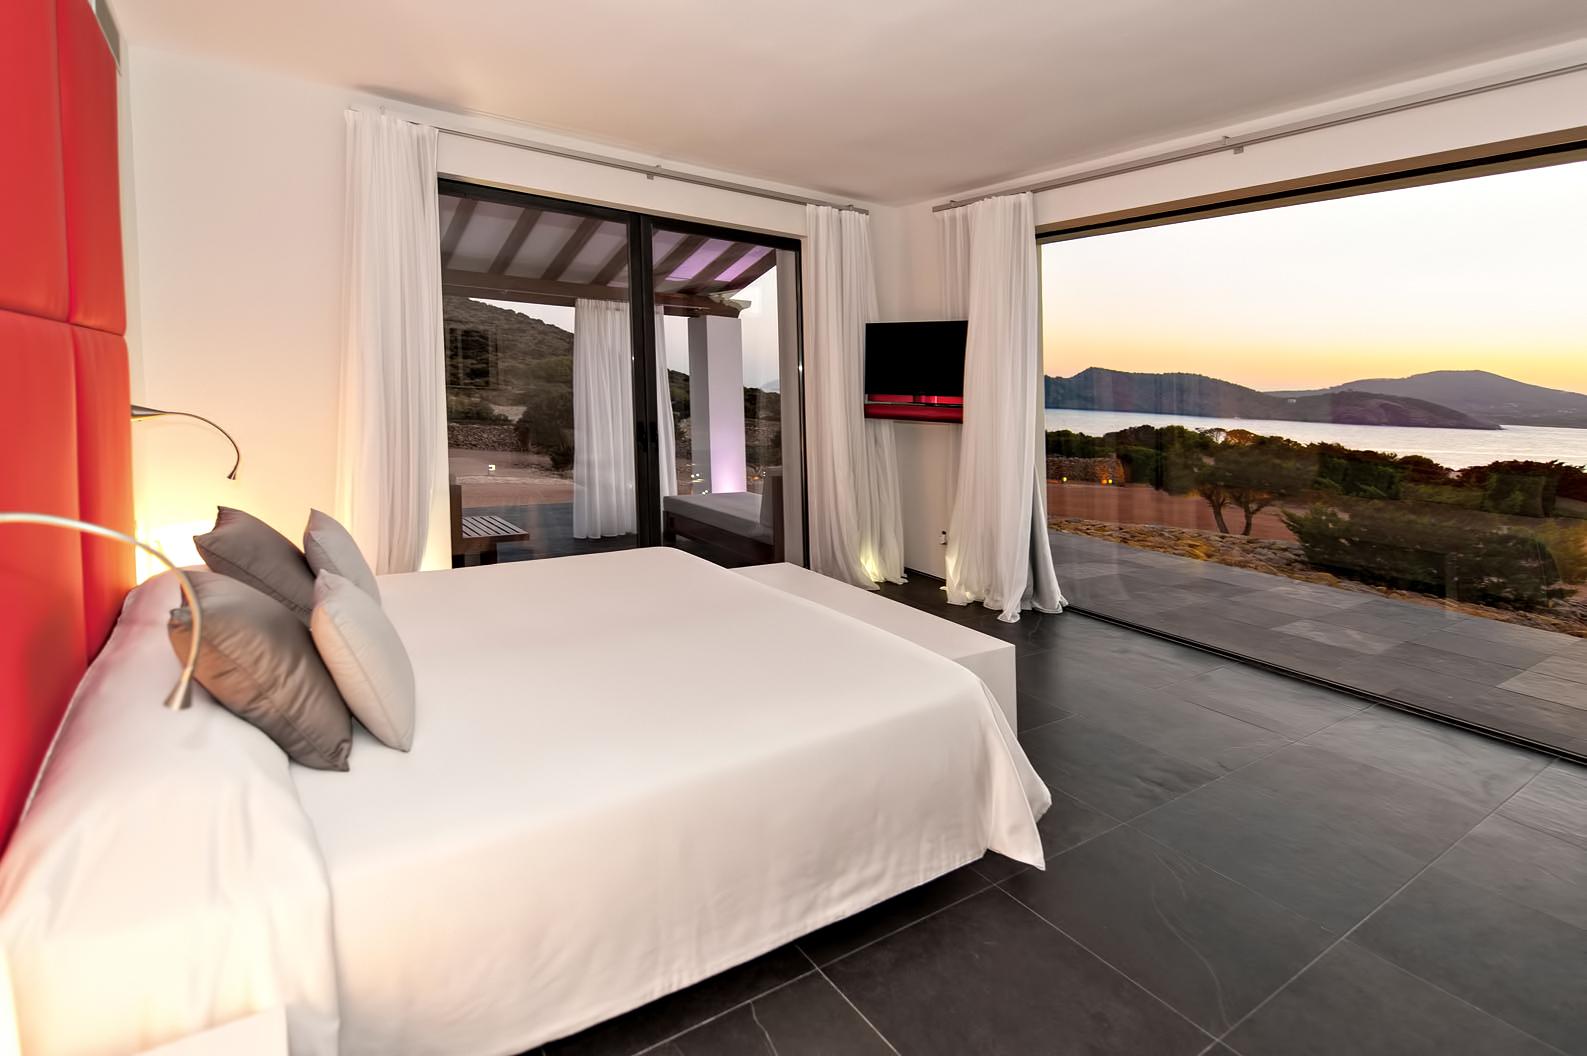 Tagomago Private Island Villa – Ibiza, Balearic Islands, Spain